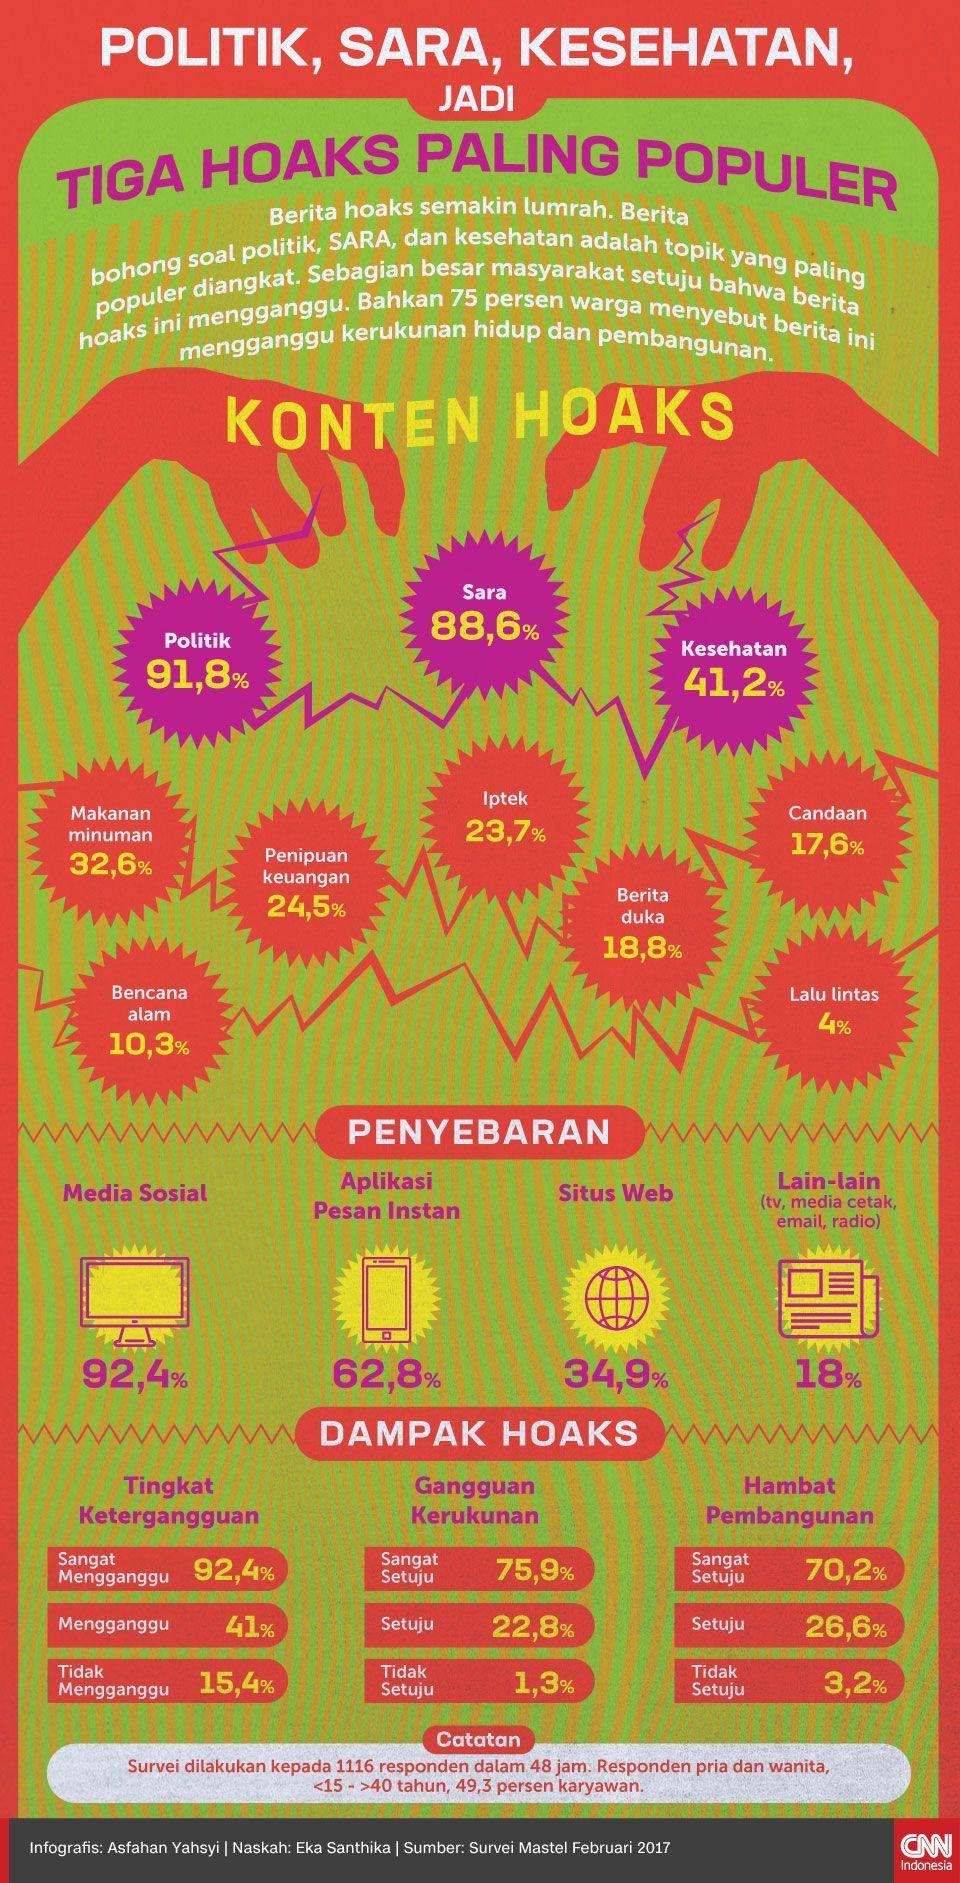 Infografis Politik, SARA, Kesehatan, Jadi Tiga Hoaks Paling Populer